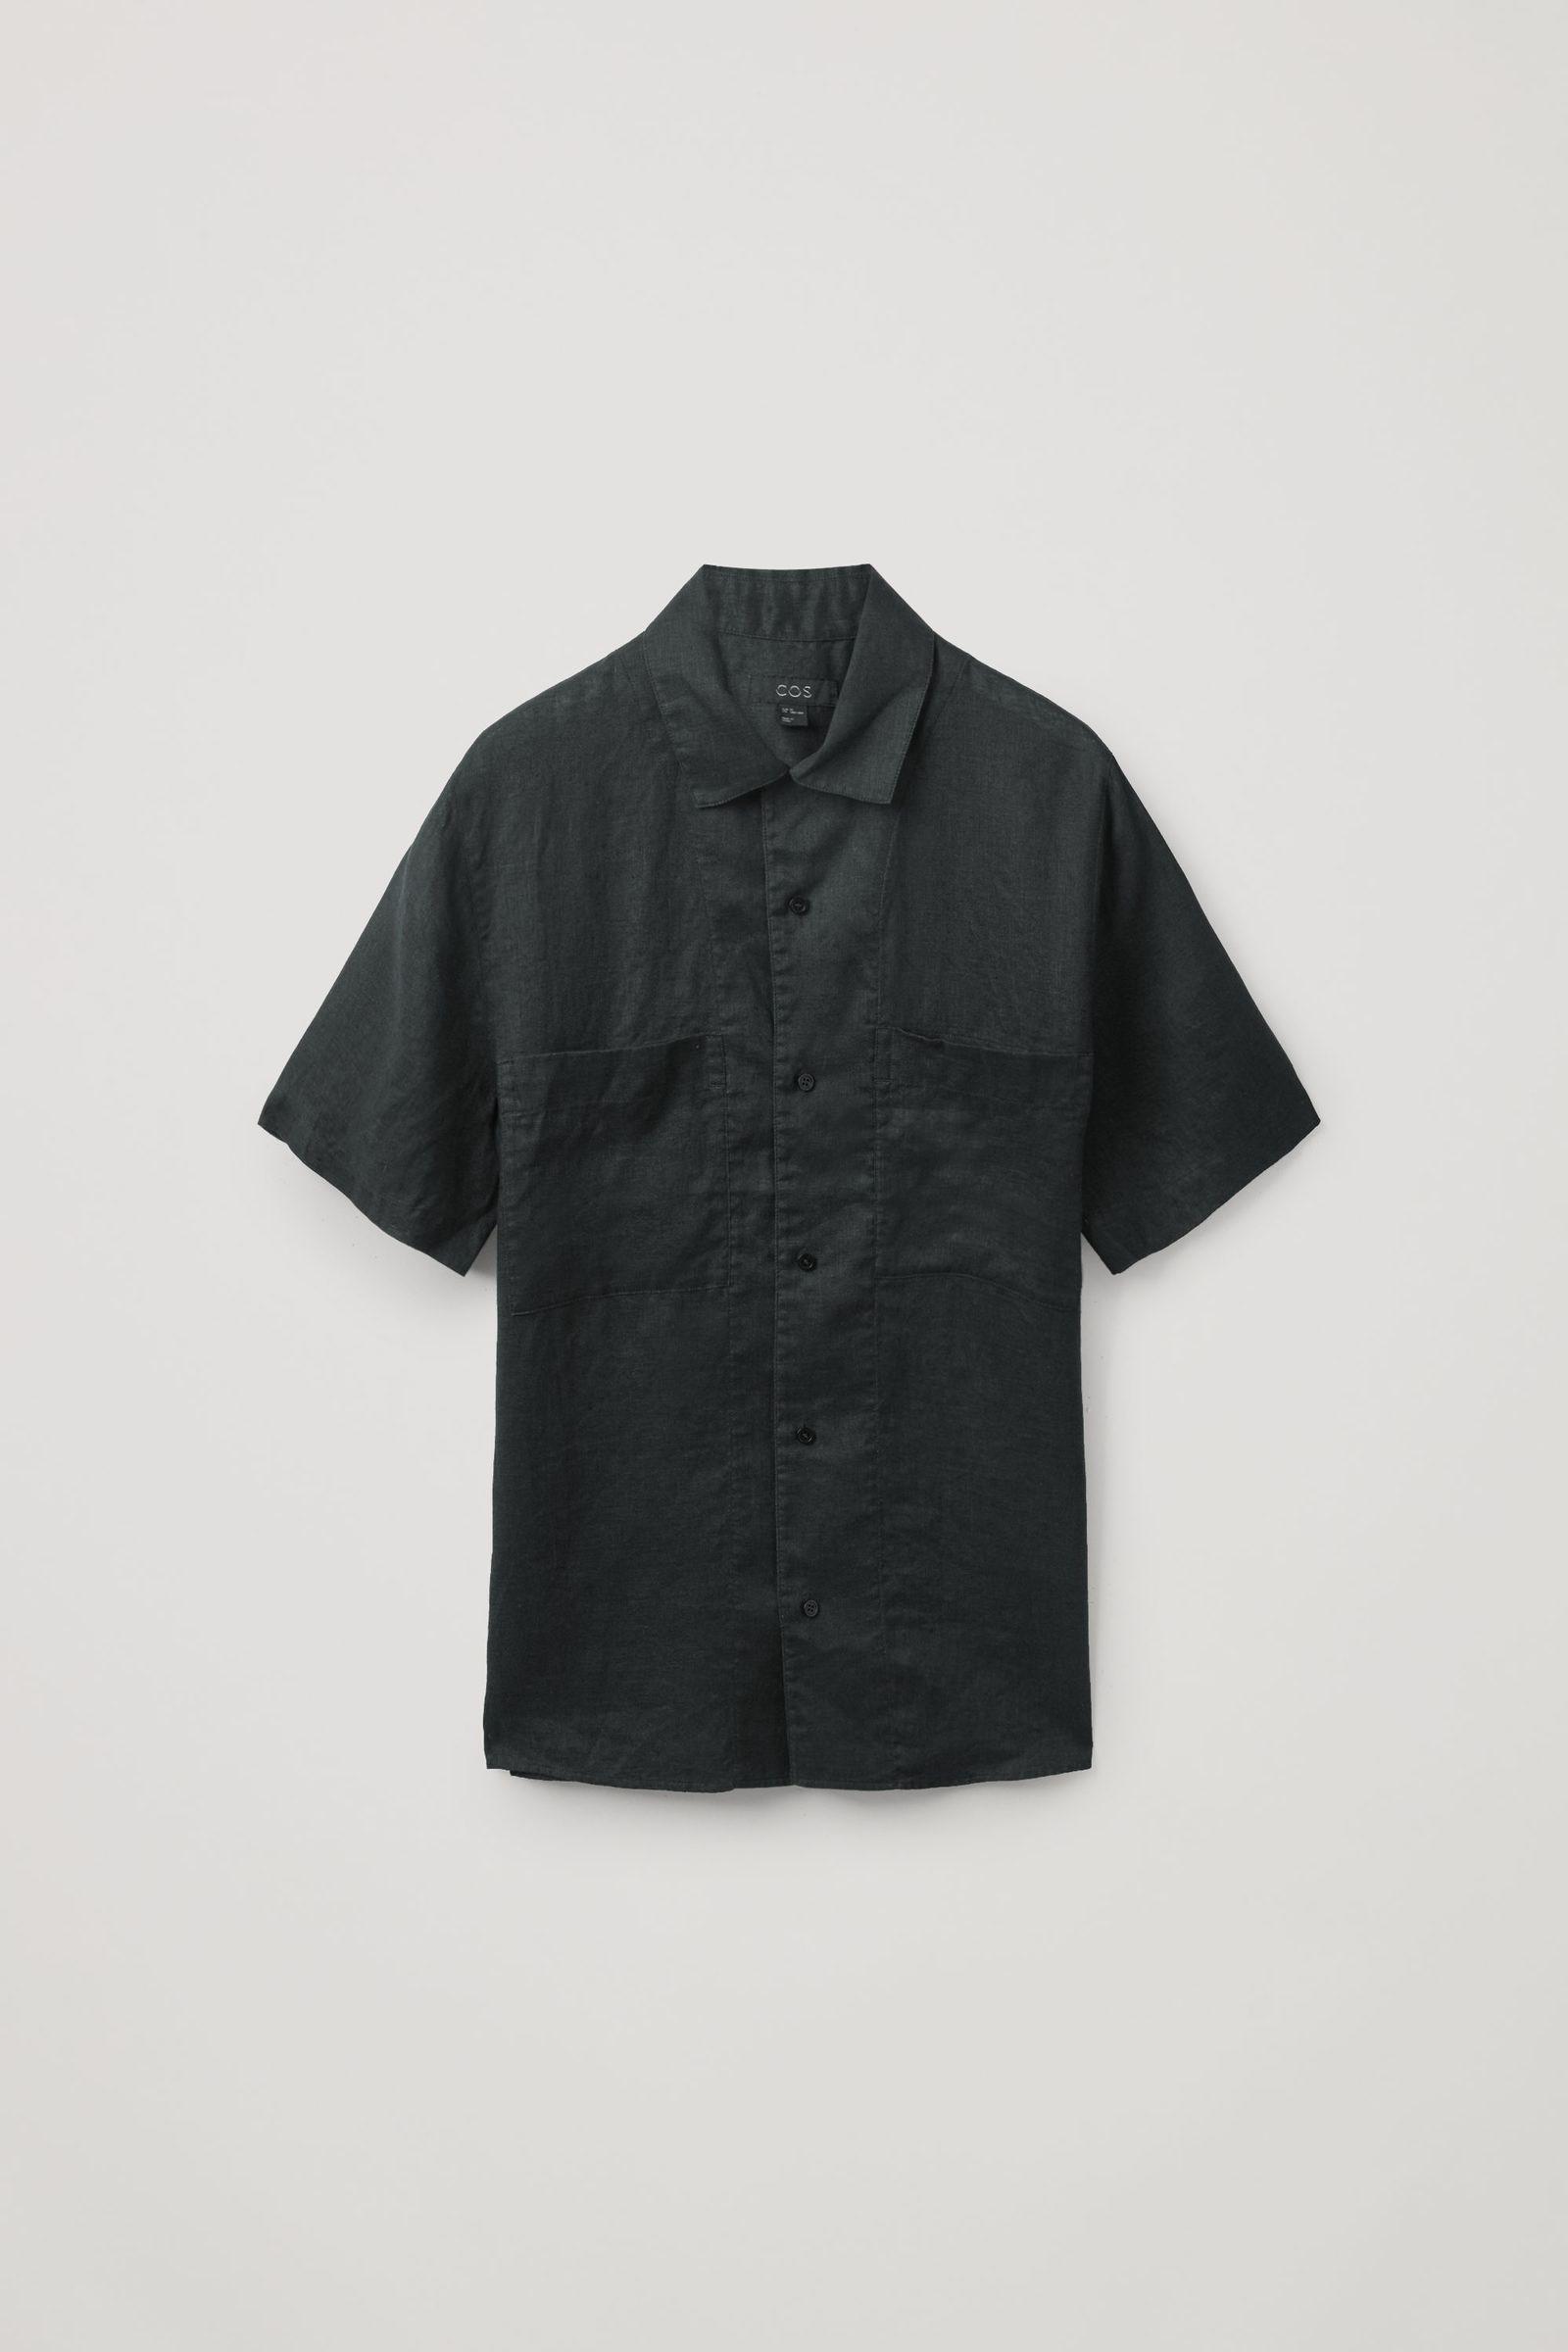 COS 캠프 칼라 쇼트 슬리브 셔츠의 블랙컬러 Product입니다.